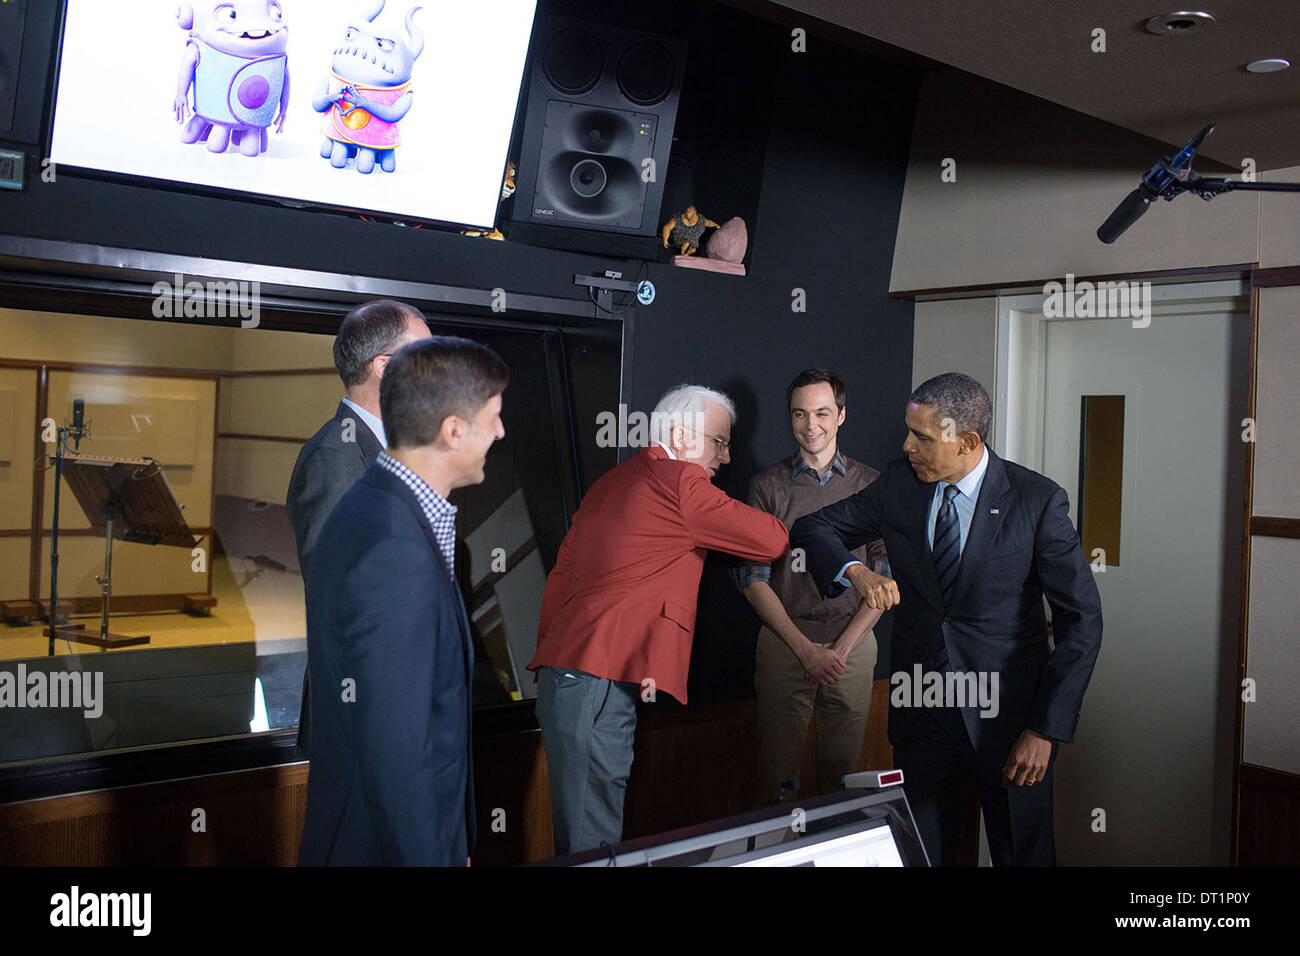 US President Barack Obama elbow bumps comedian Steve Martin during a tour of the Glendale campus of movie studio DreamWorks Animation SKG November 25, 2013 in Glendale, CA. - Stock Image